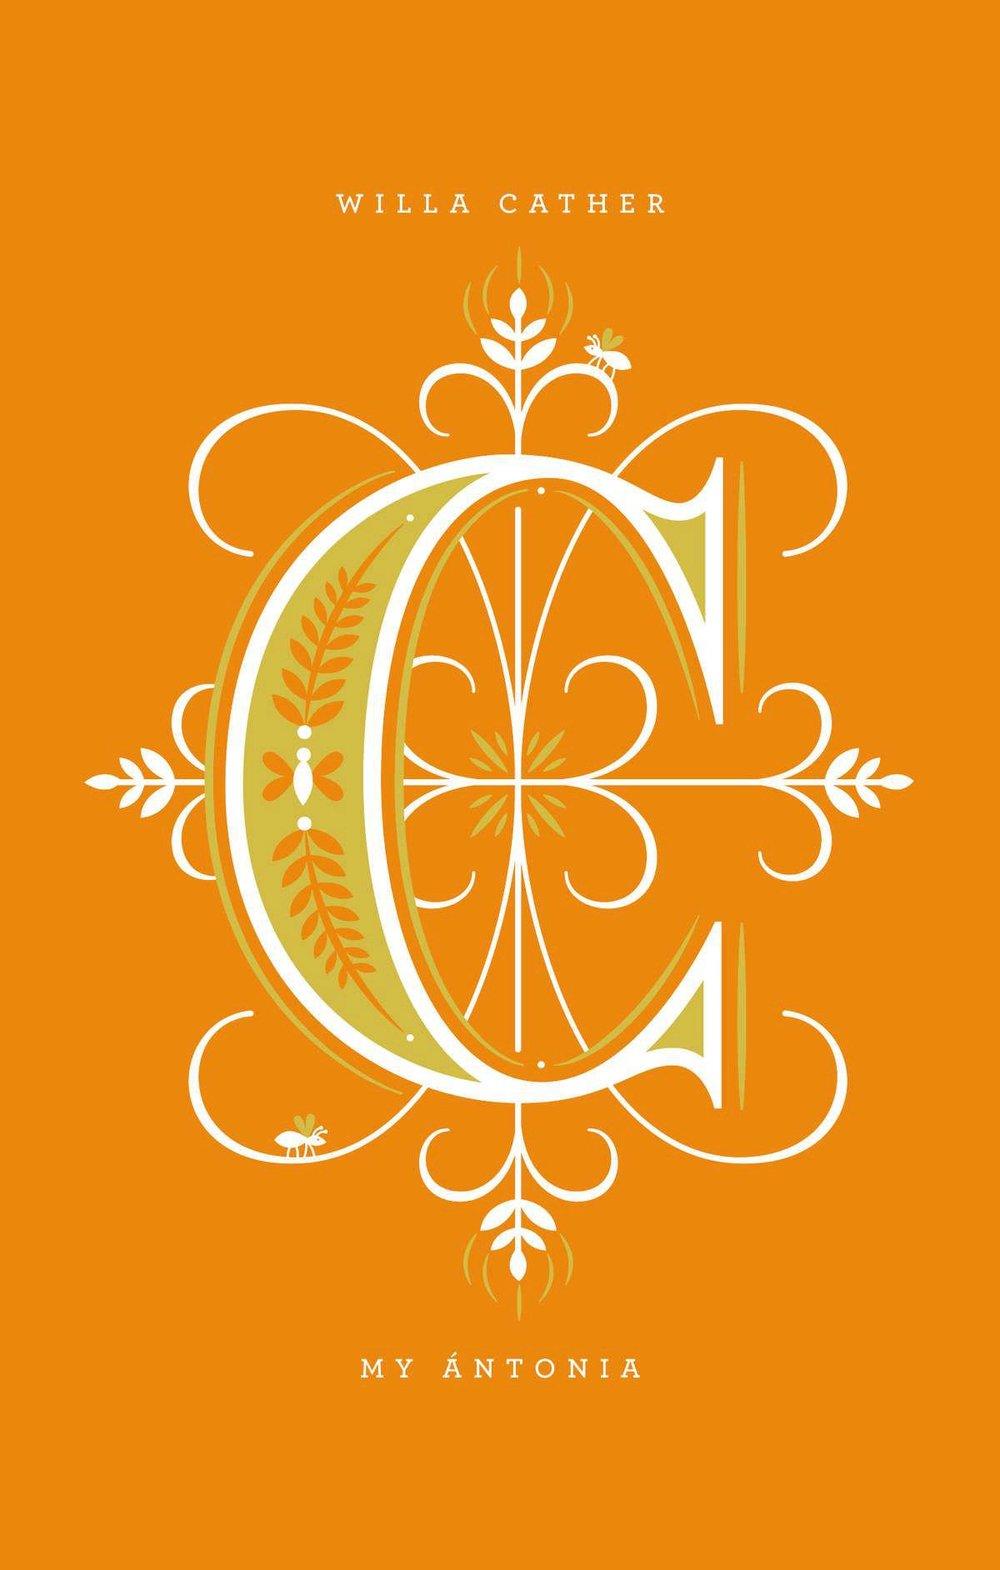 Jessica Hische  Illustrator / Type Designer jessicahische.is/awesome San Francisco, US